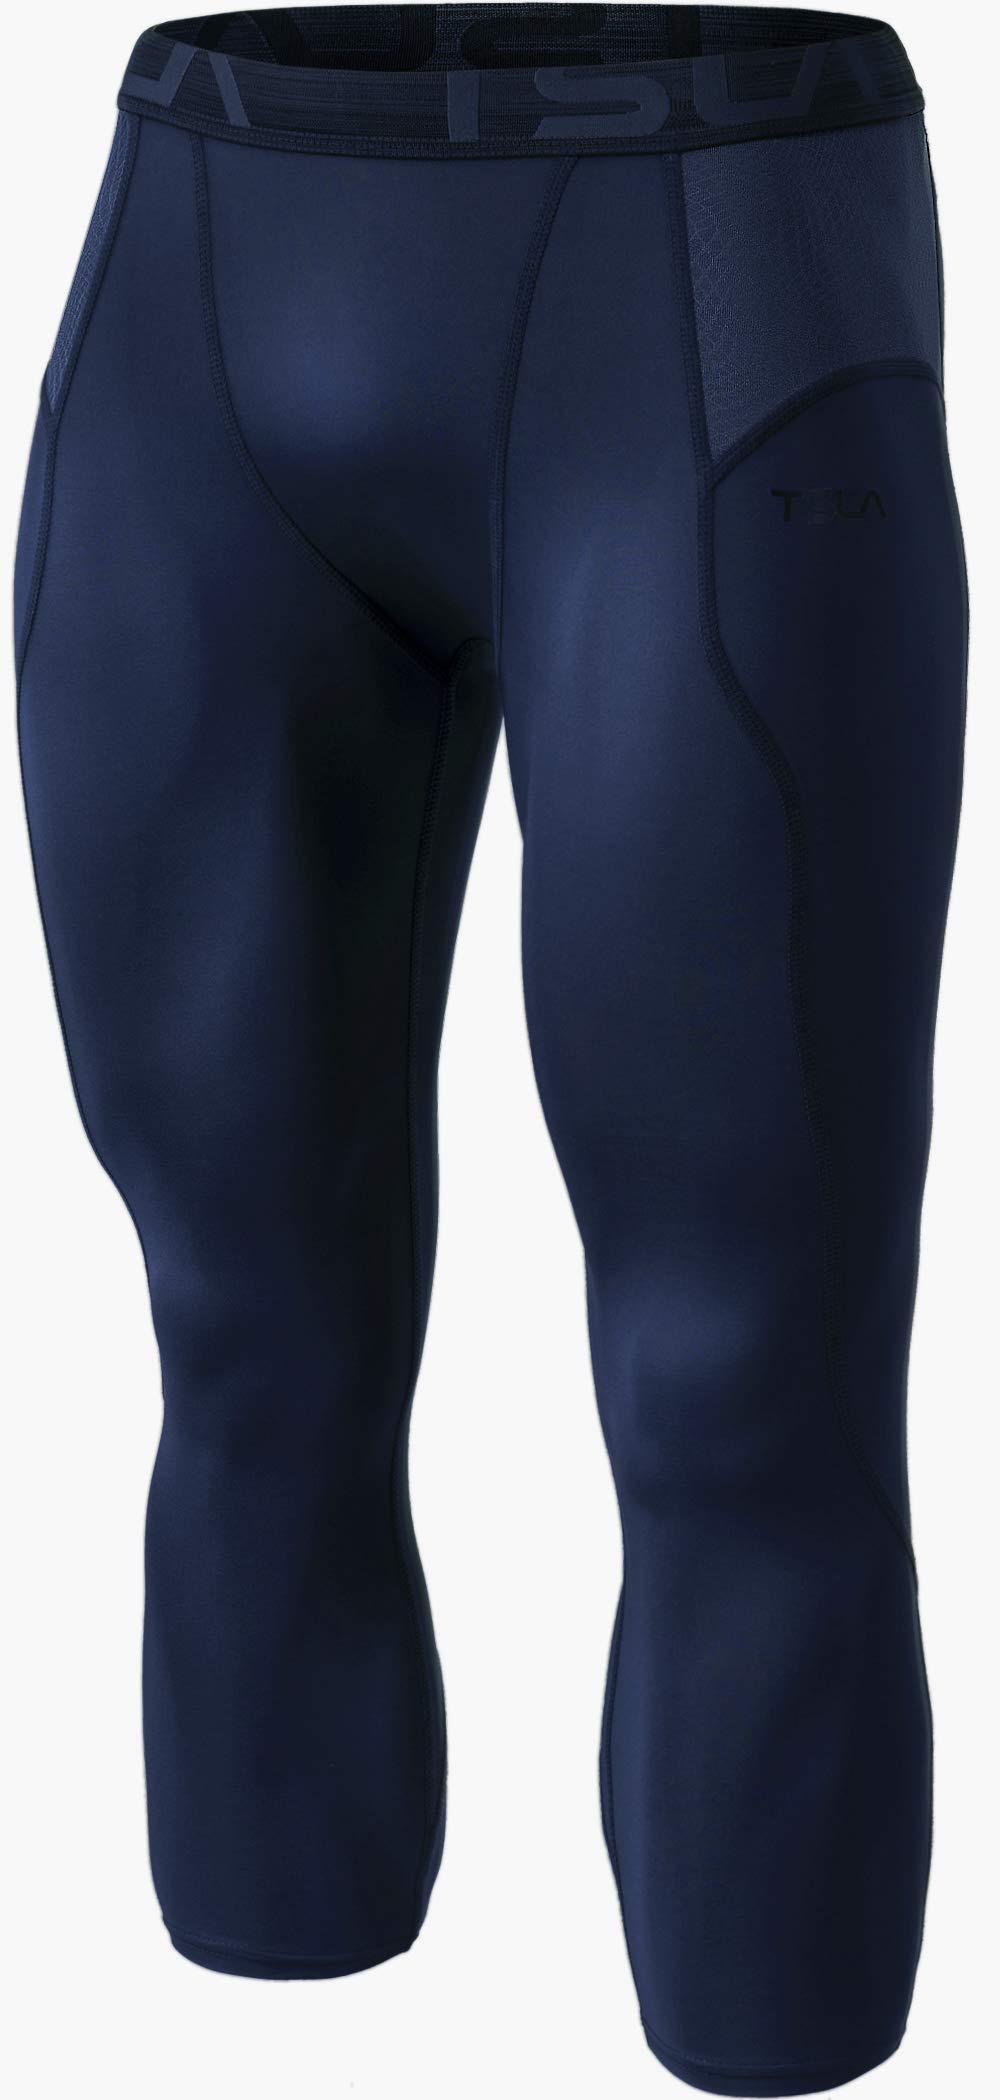 TSLA Men's Compression 3/4 Capri Pants Baselayer Cool Dry Sports Running Yoga Tights, Print(muc28) - Navy, Small by TSLA